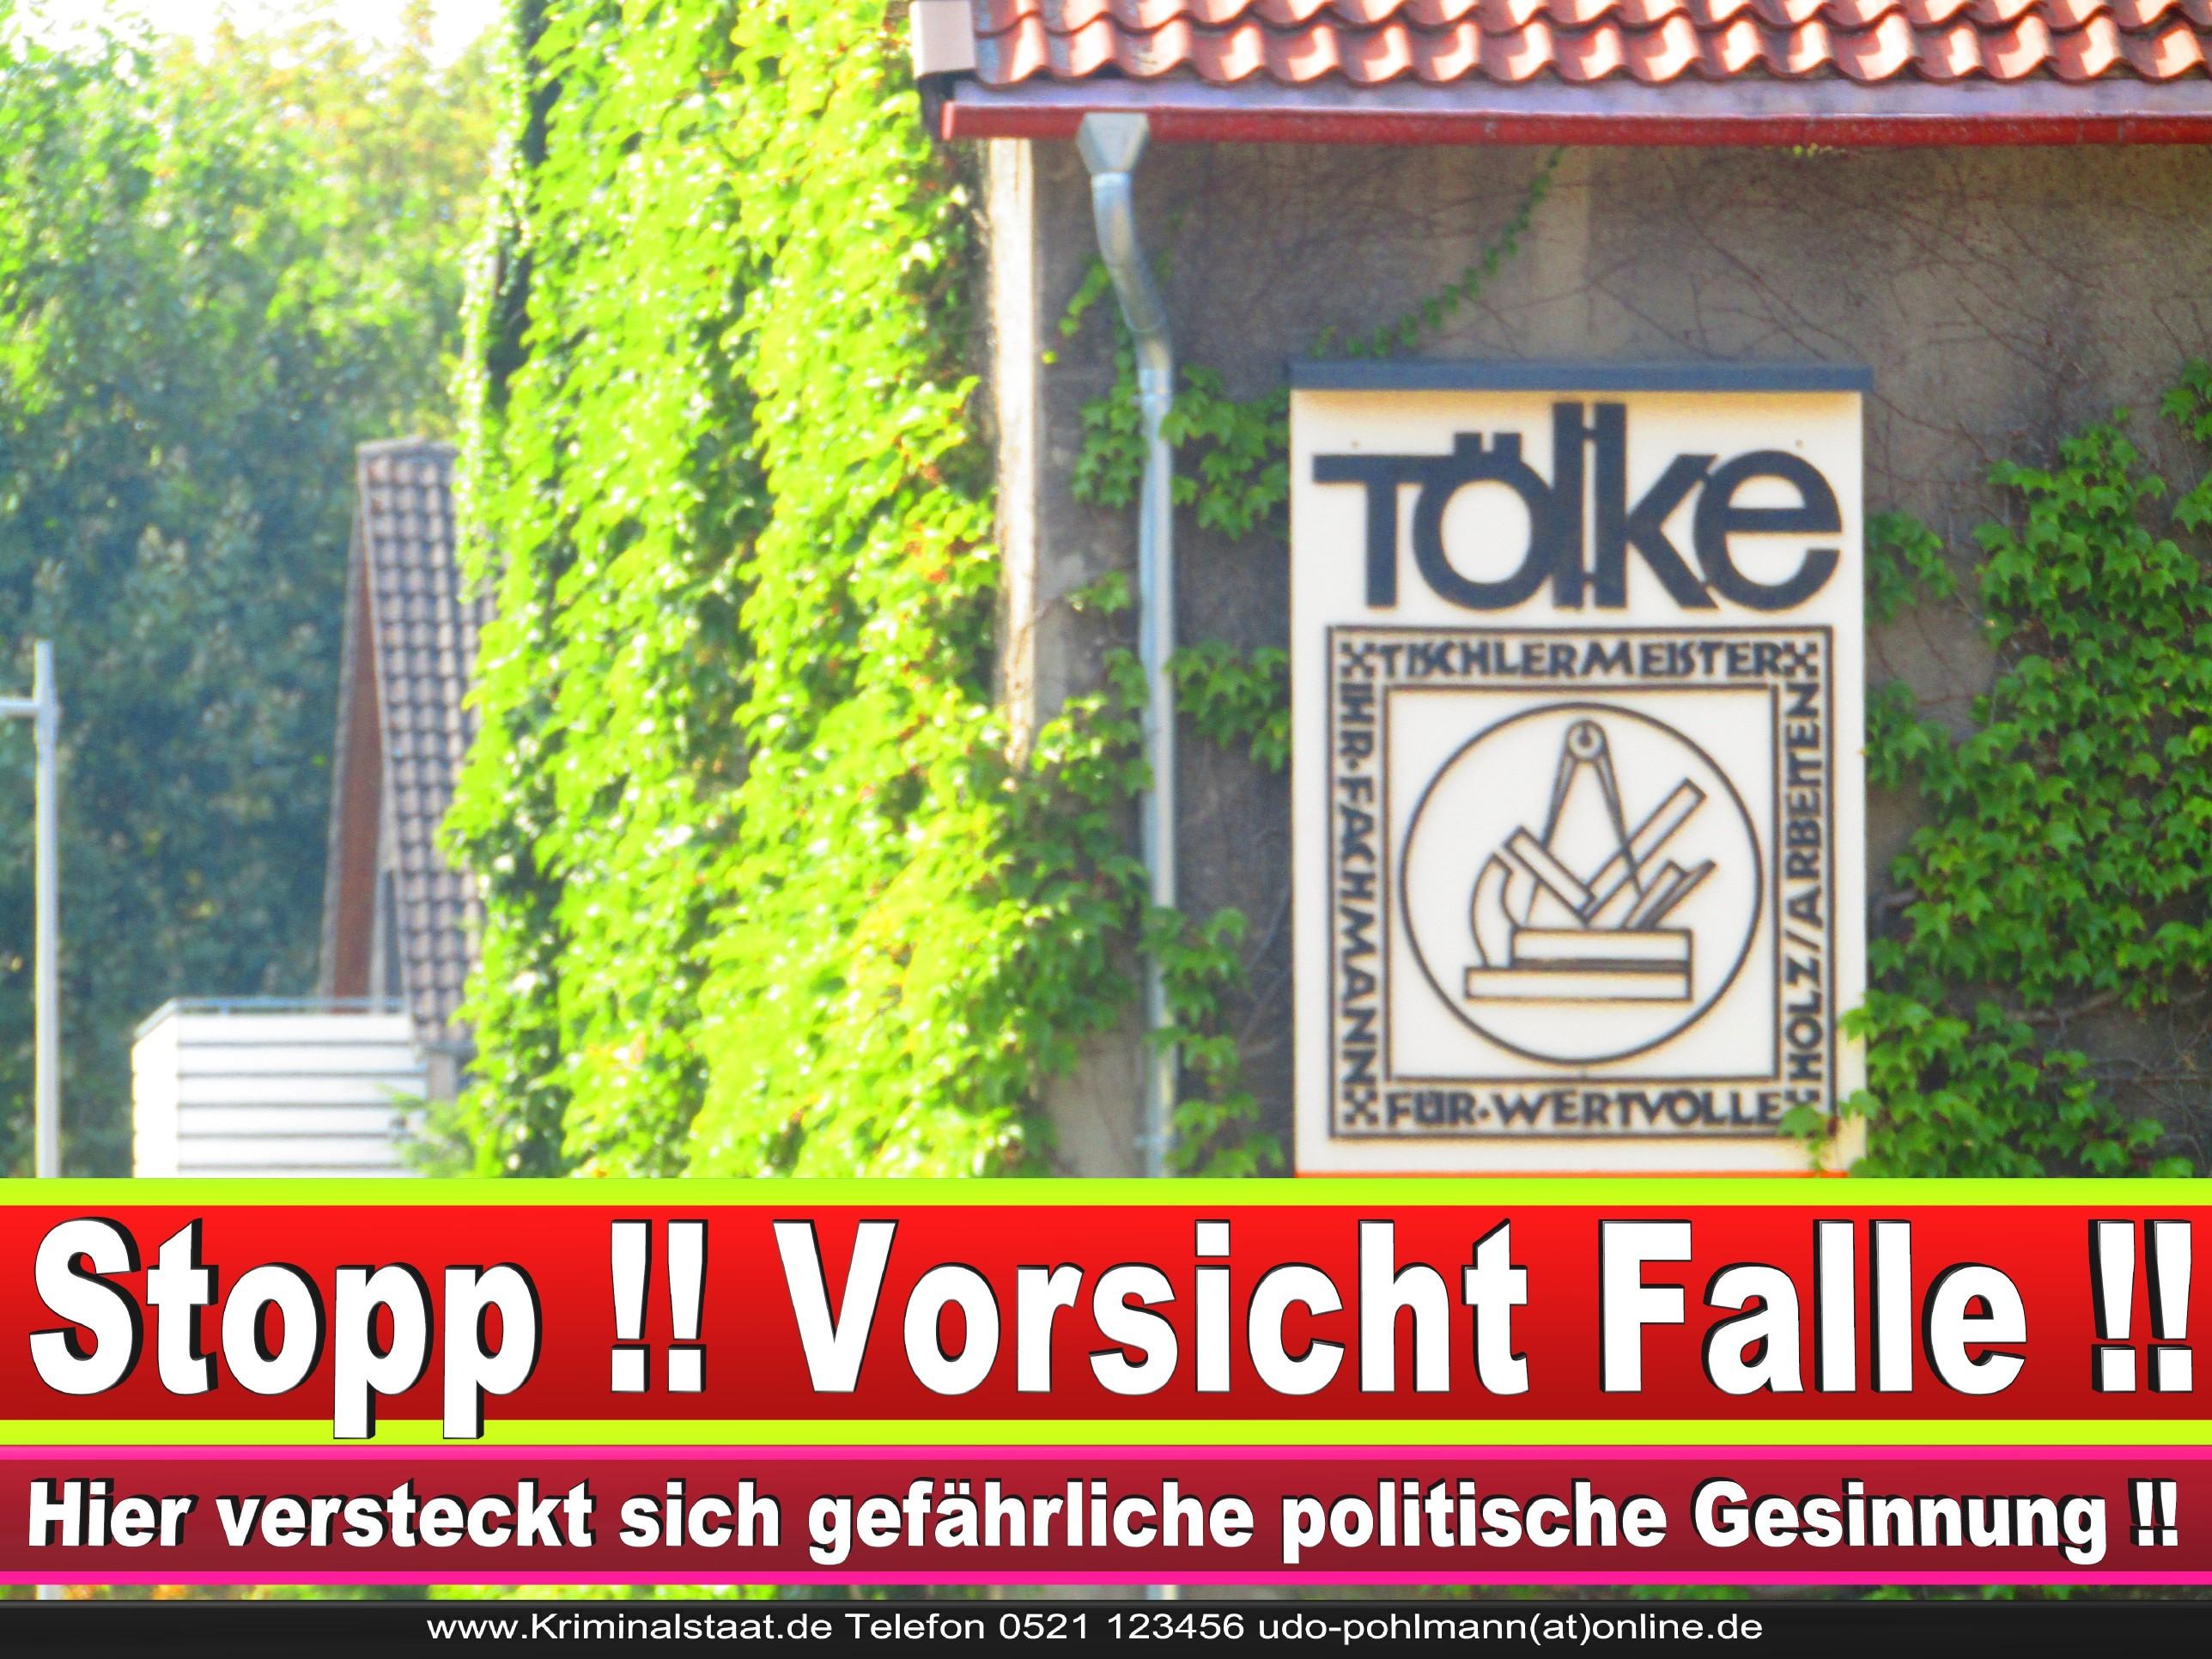 TISCHLEREI TOELKE CDU BIELEFELD TÖLKE 2 LANDTAGSWAHL BUNDESTAGSWAHL BÜRGERMEISTERWAHL